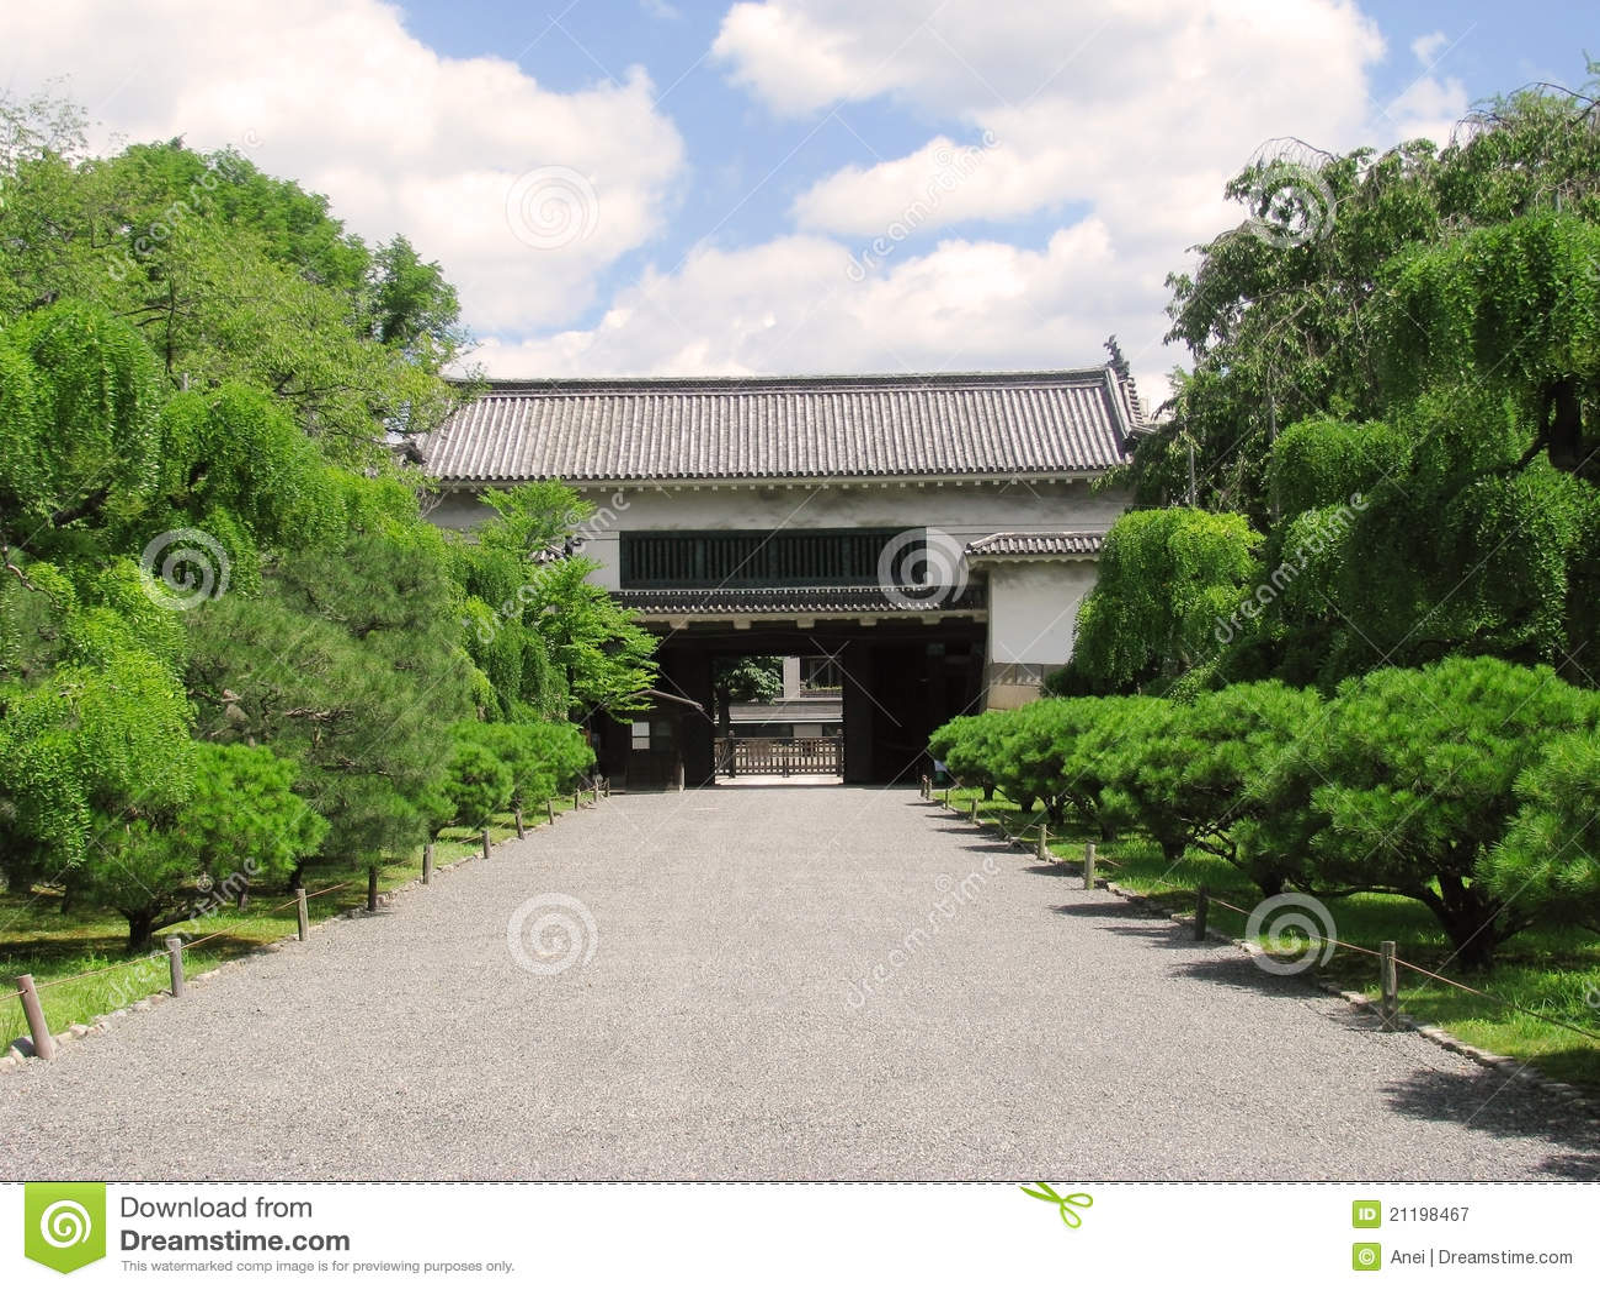 Nijo castle secondary gate and surrounding garden